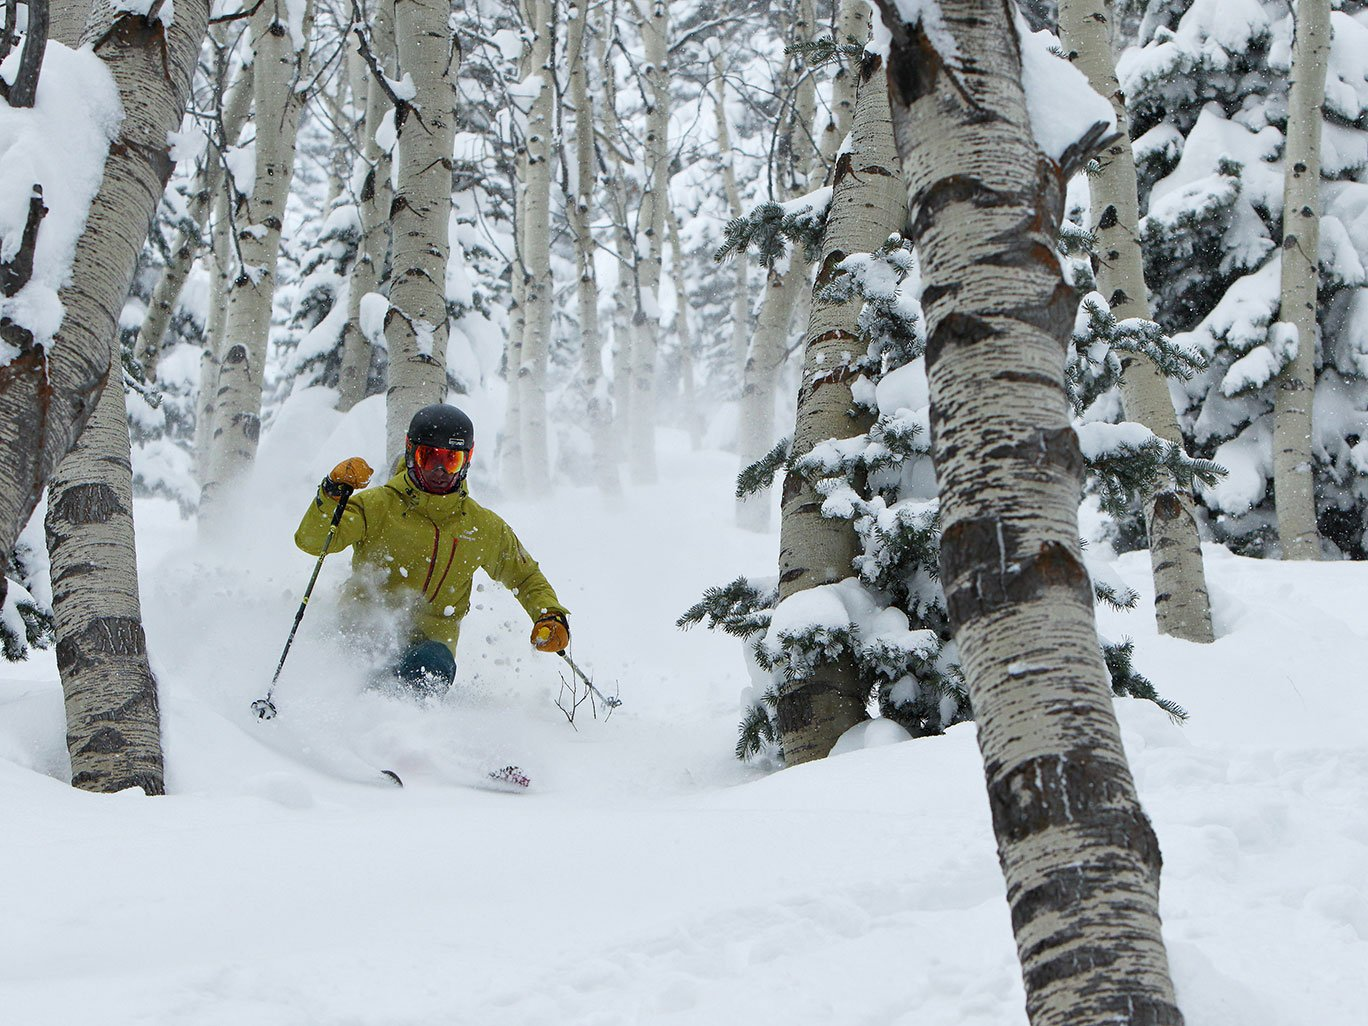 Skiing Powder in Aspen Grove